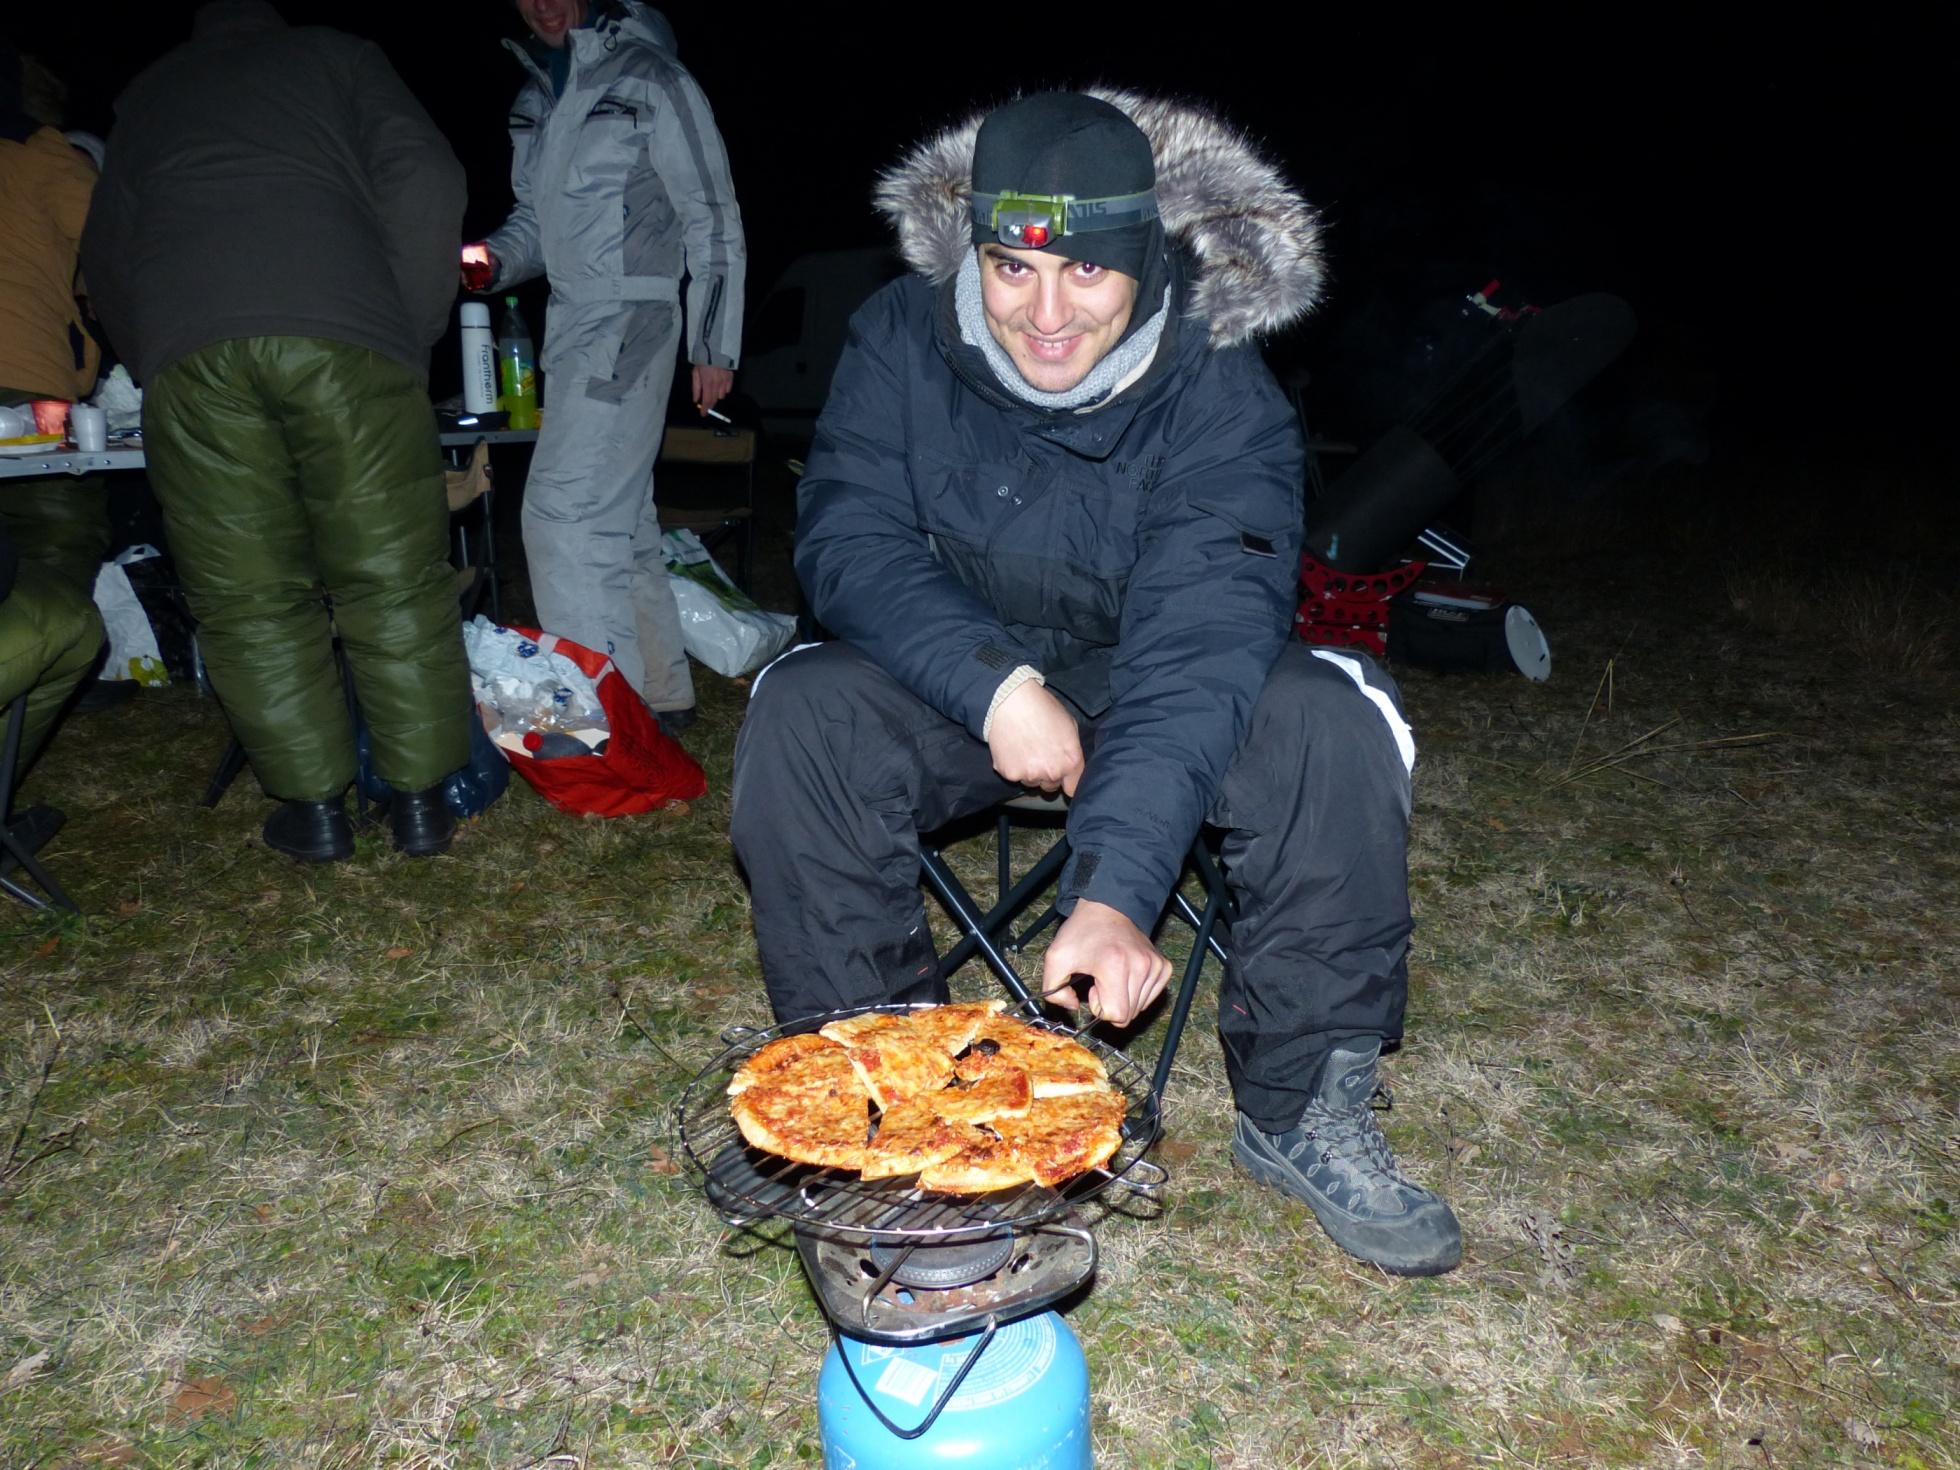 http://ekladata.com/YZXK2xiUNNTKFL8JhNJ3jzHhHkk/RAGBR-70-pizza-florian.jpg